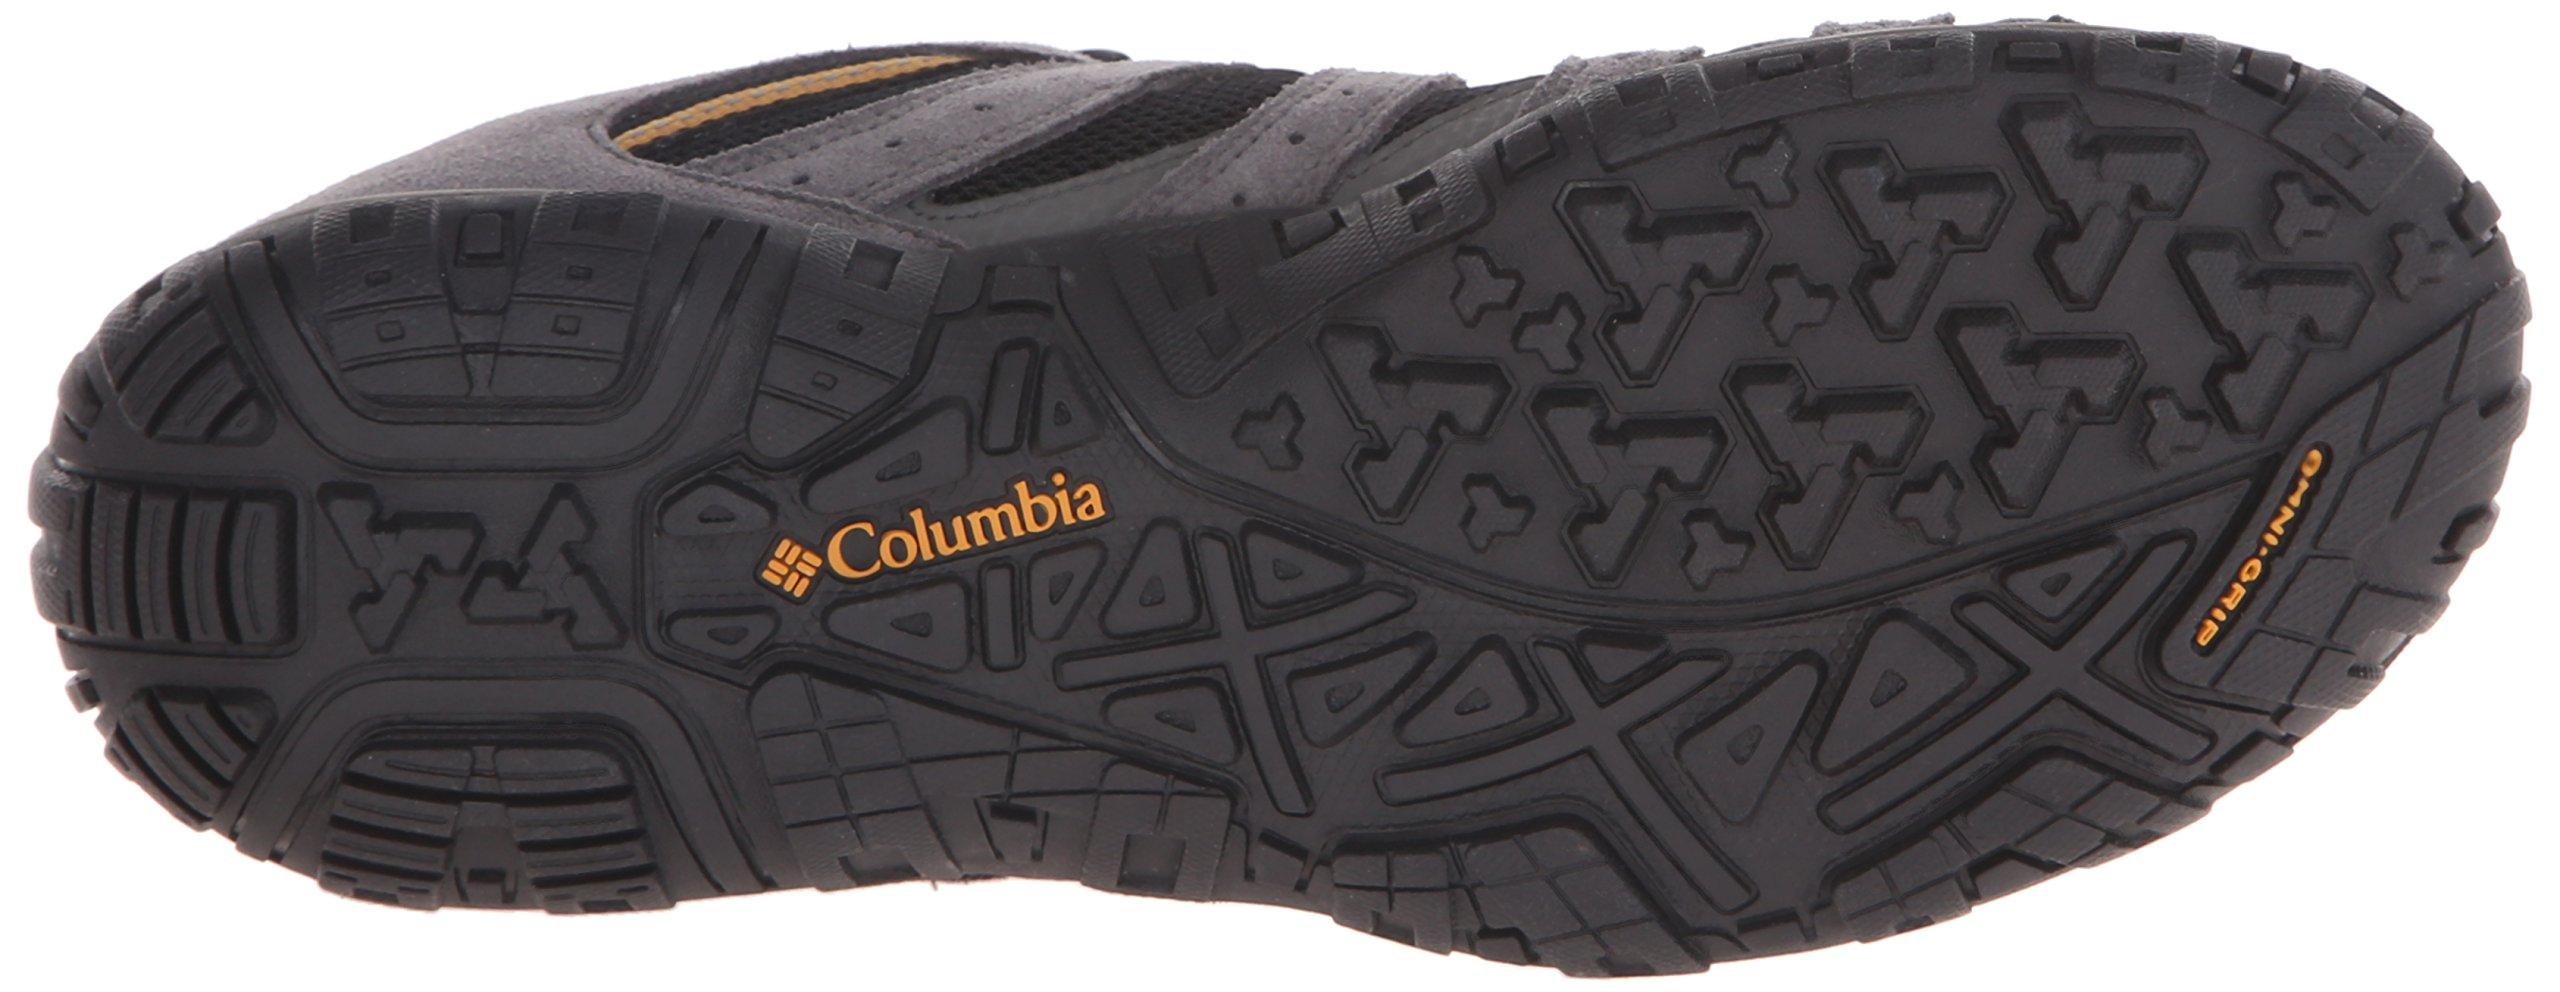 Columbia Men's Redmond Waterproof Hiking Shoe Black, Squash 7.5 D US by Columbia (Image #3)